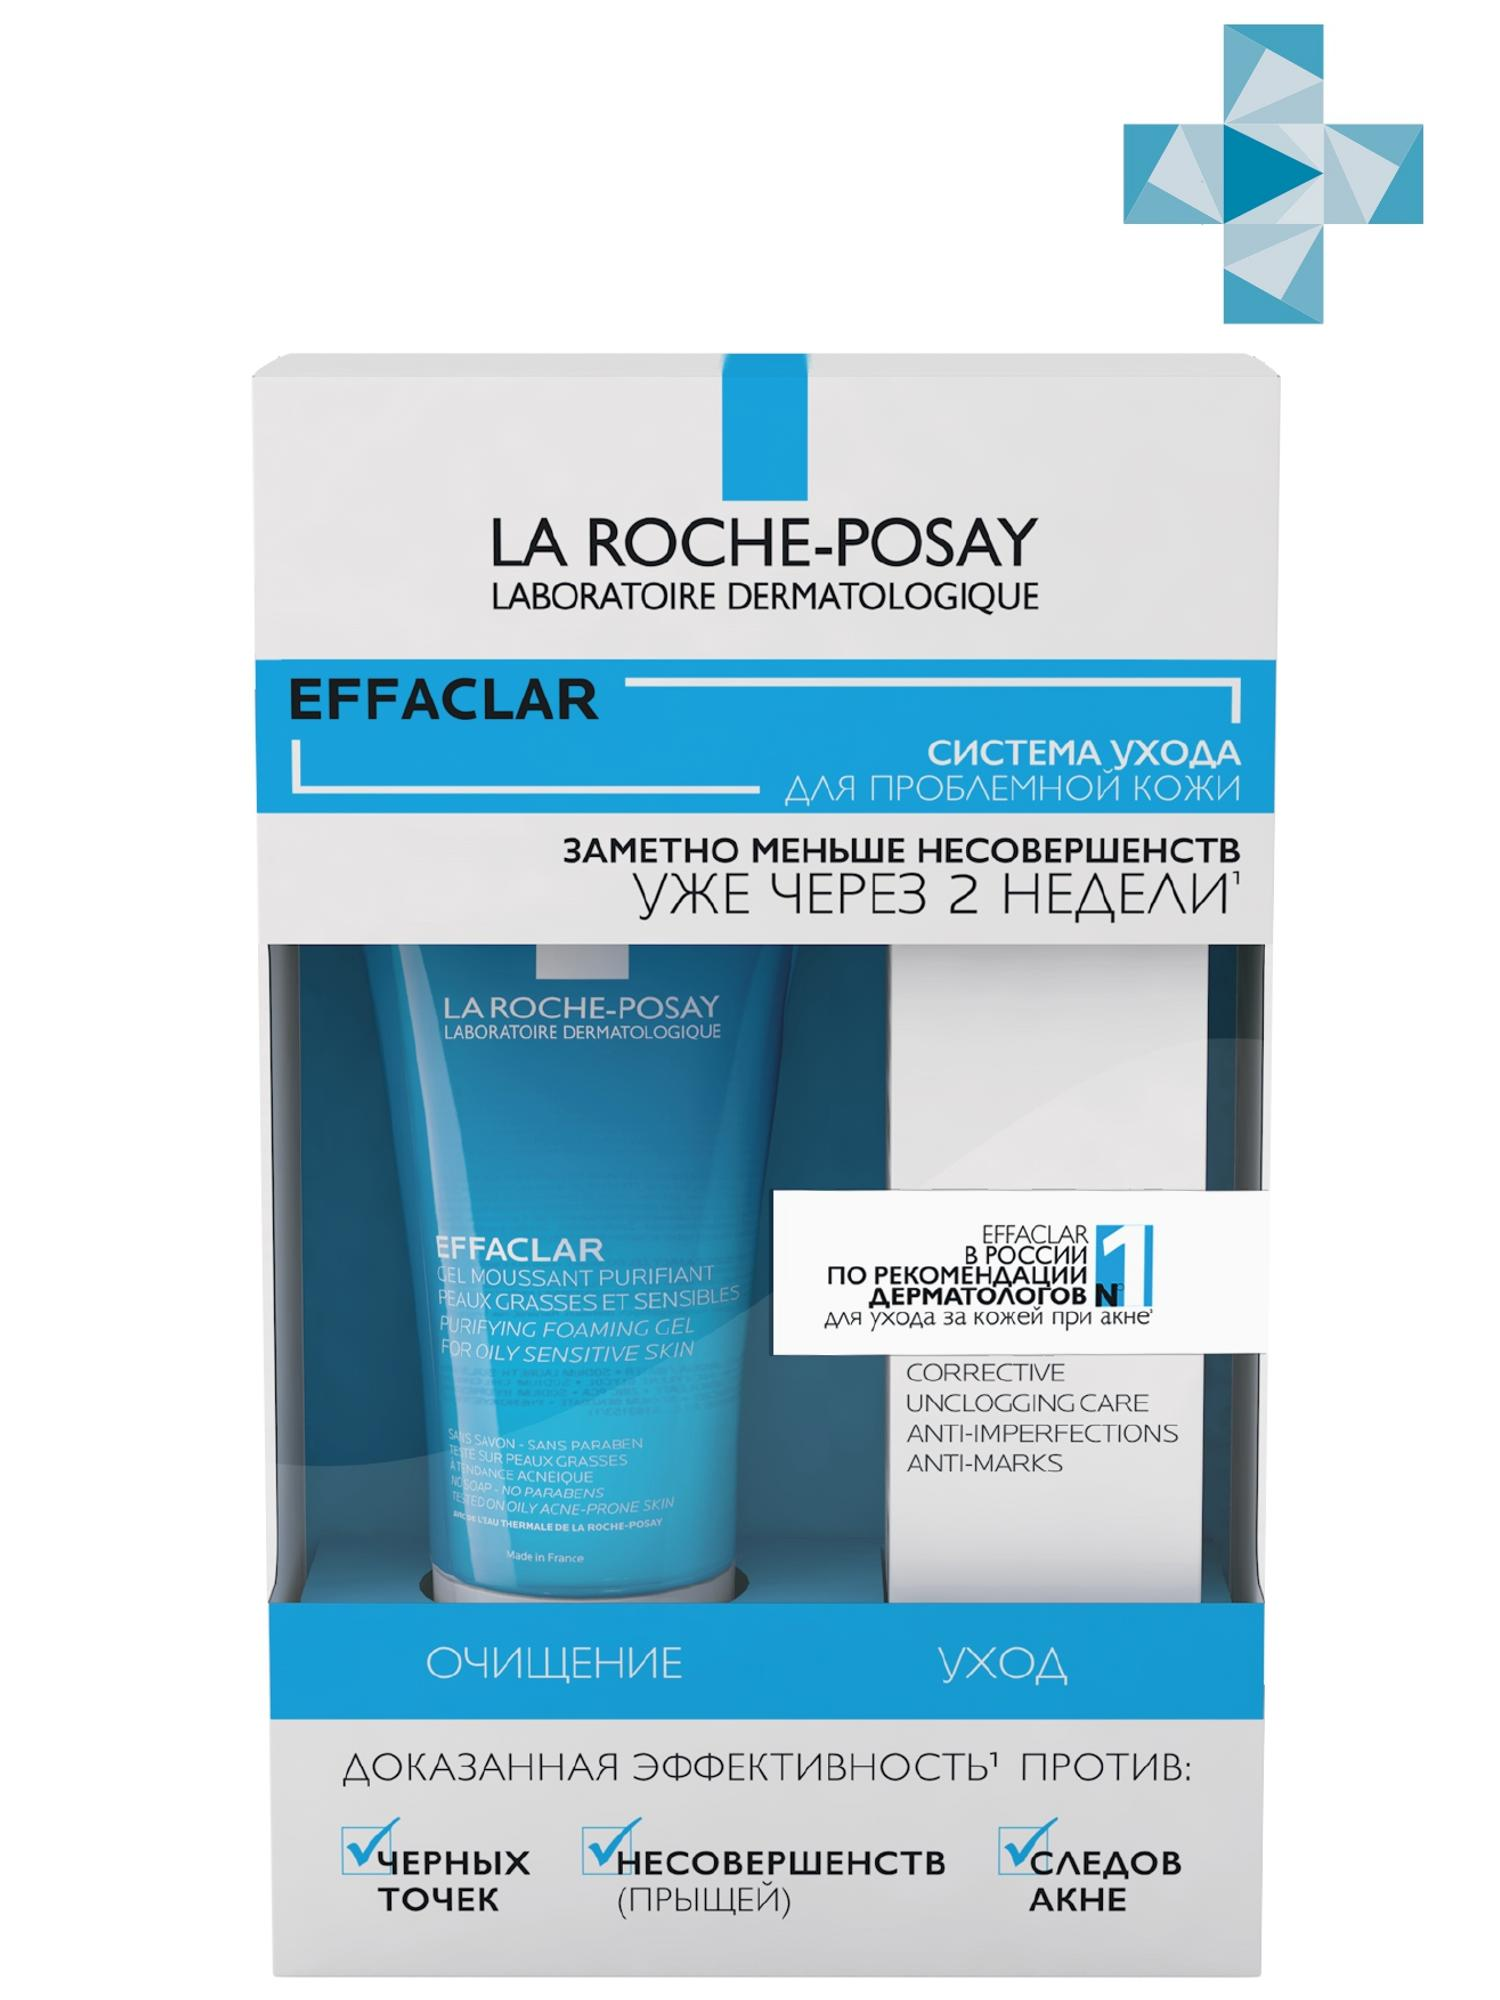 La Roche-Posay Набор Эфаклар гель 50 мл + Эфаклар Дуо(+) 15 мл (La Roche-Posay, Effaclar) недорого